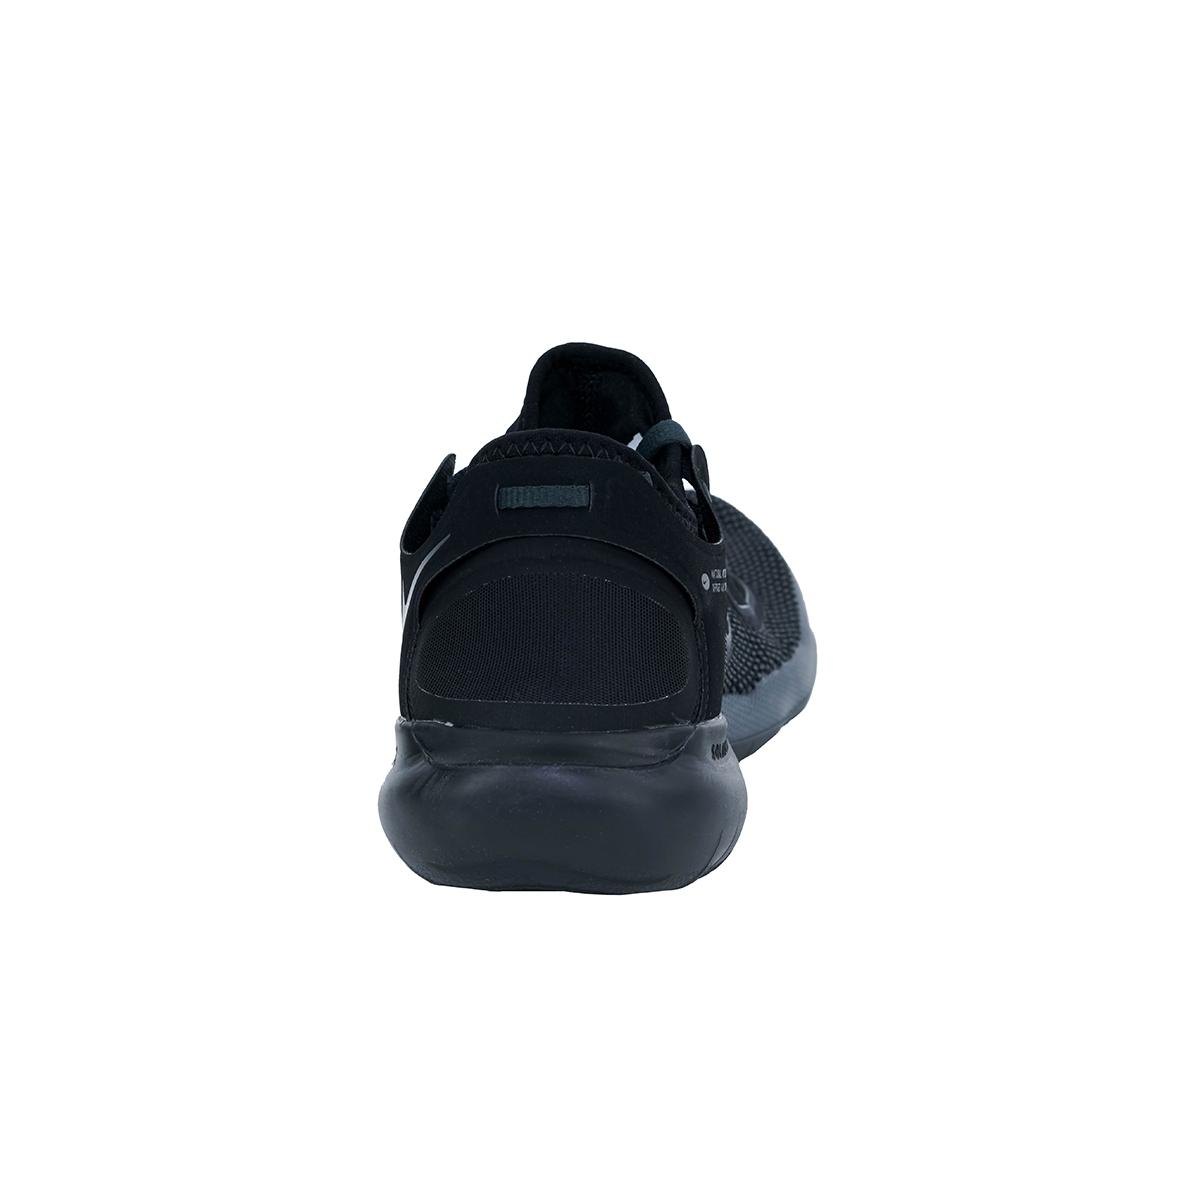 Nike-Men-039-s-Flex-RN-2019-Running-Shoes thumbnail 8